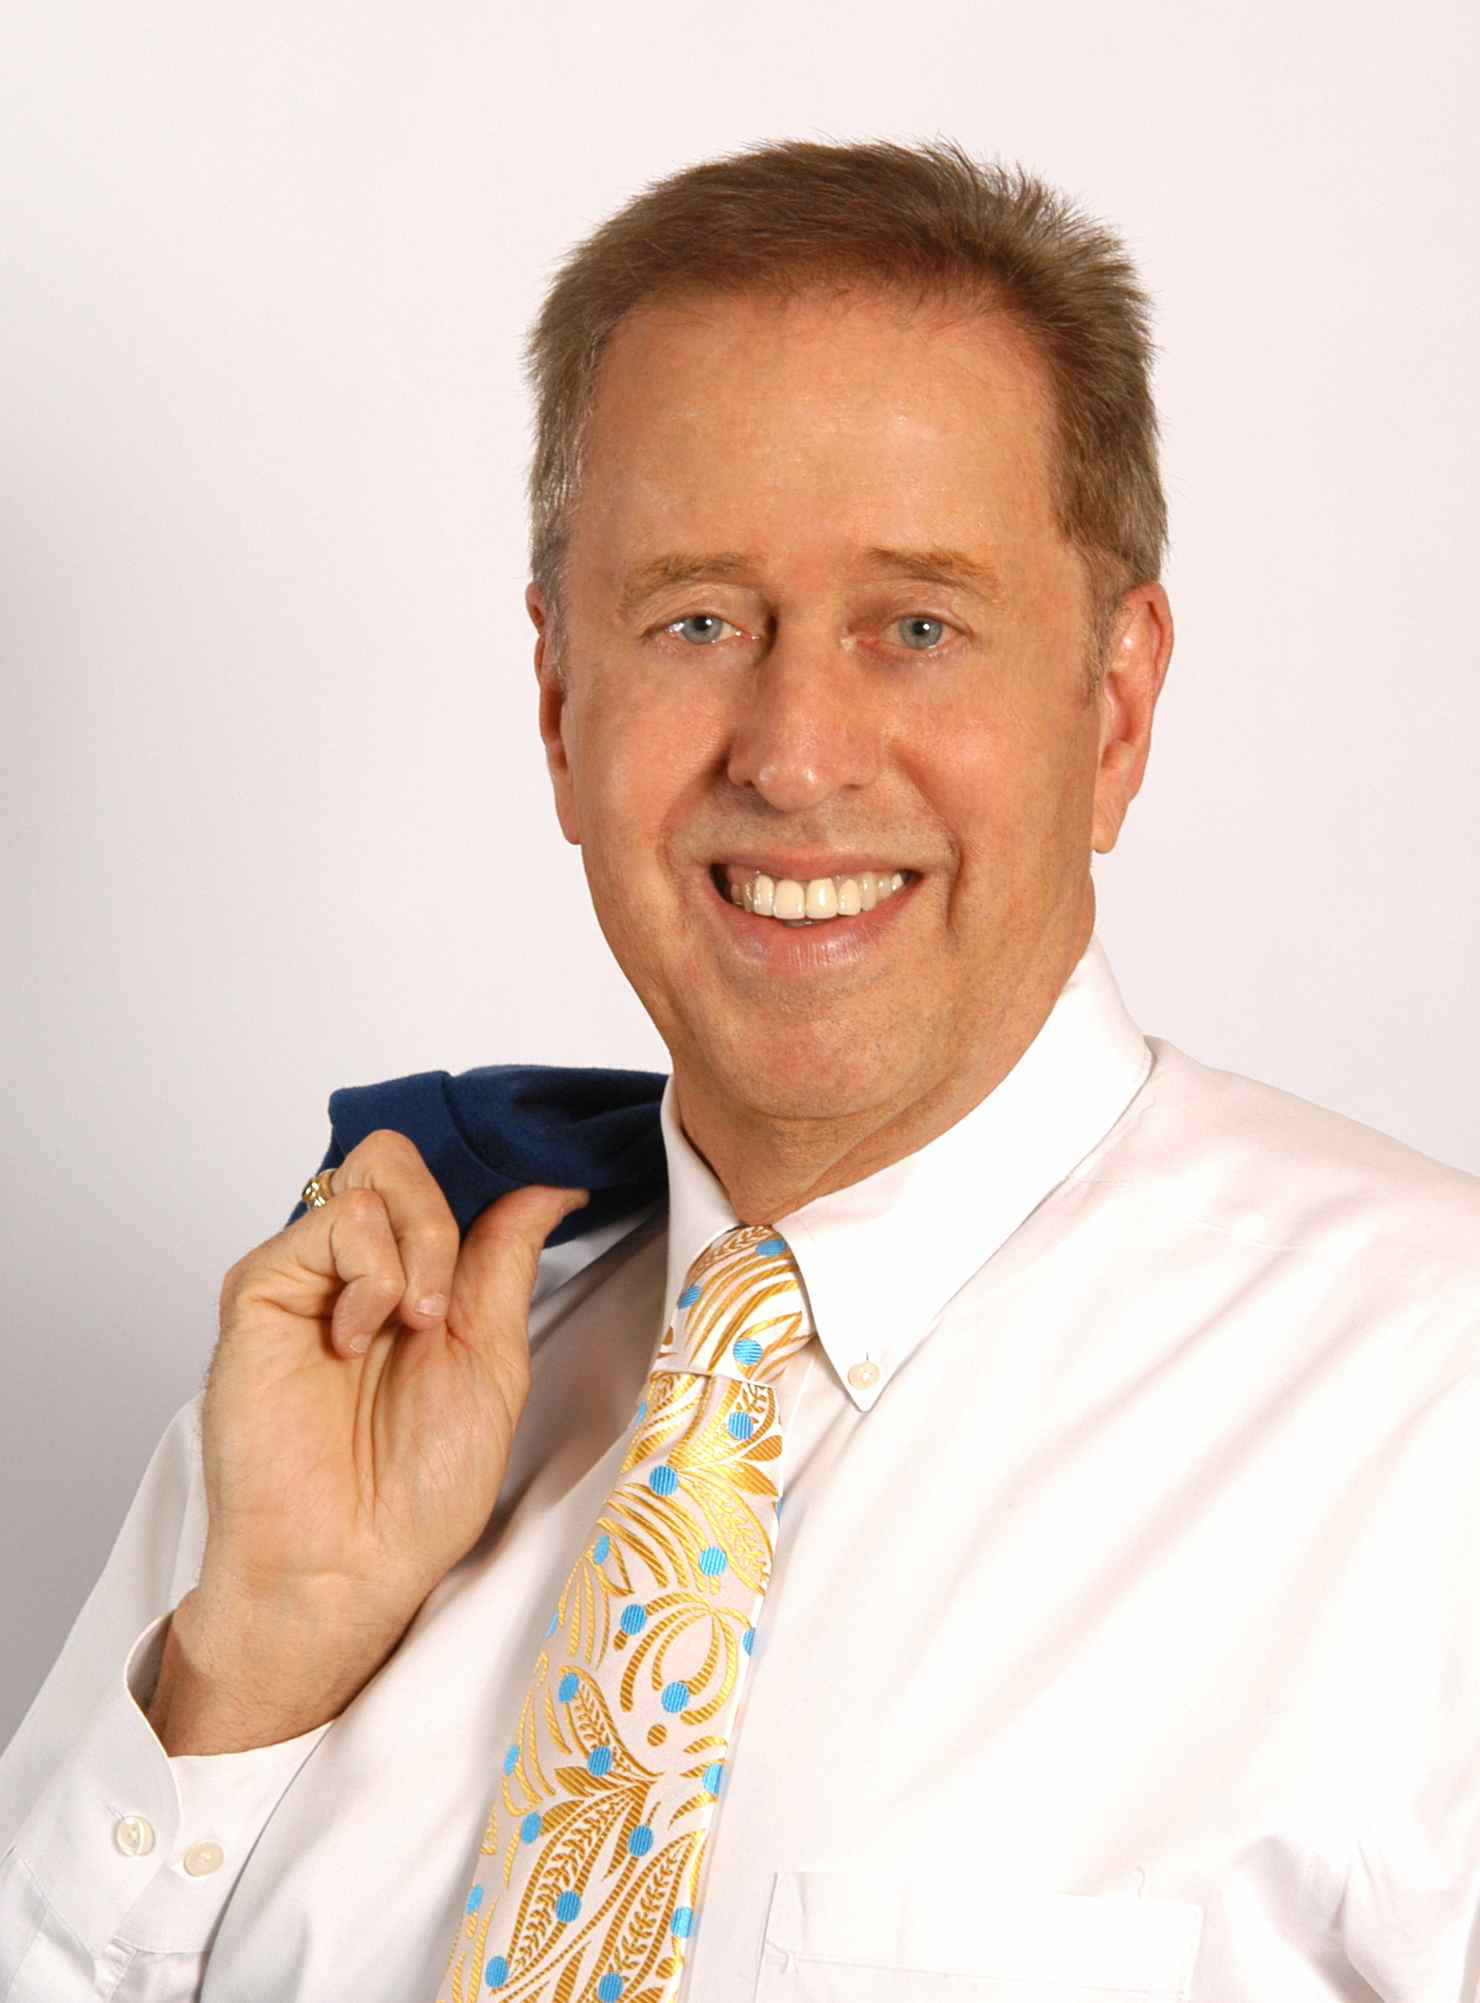 Jim Briggs